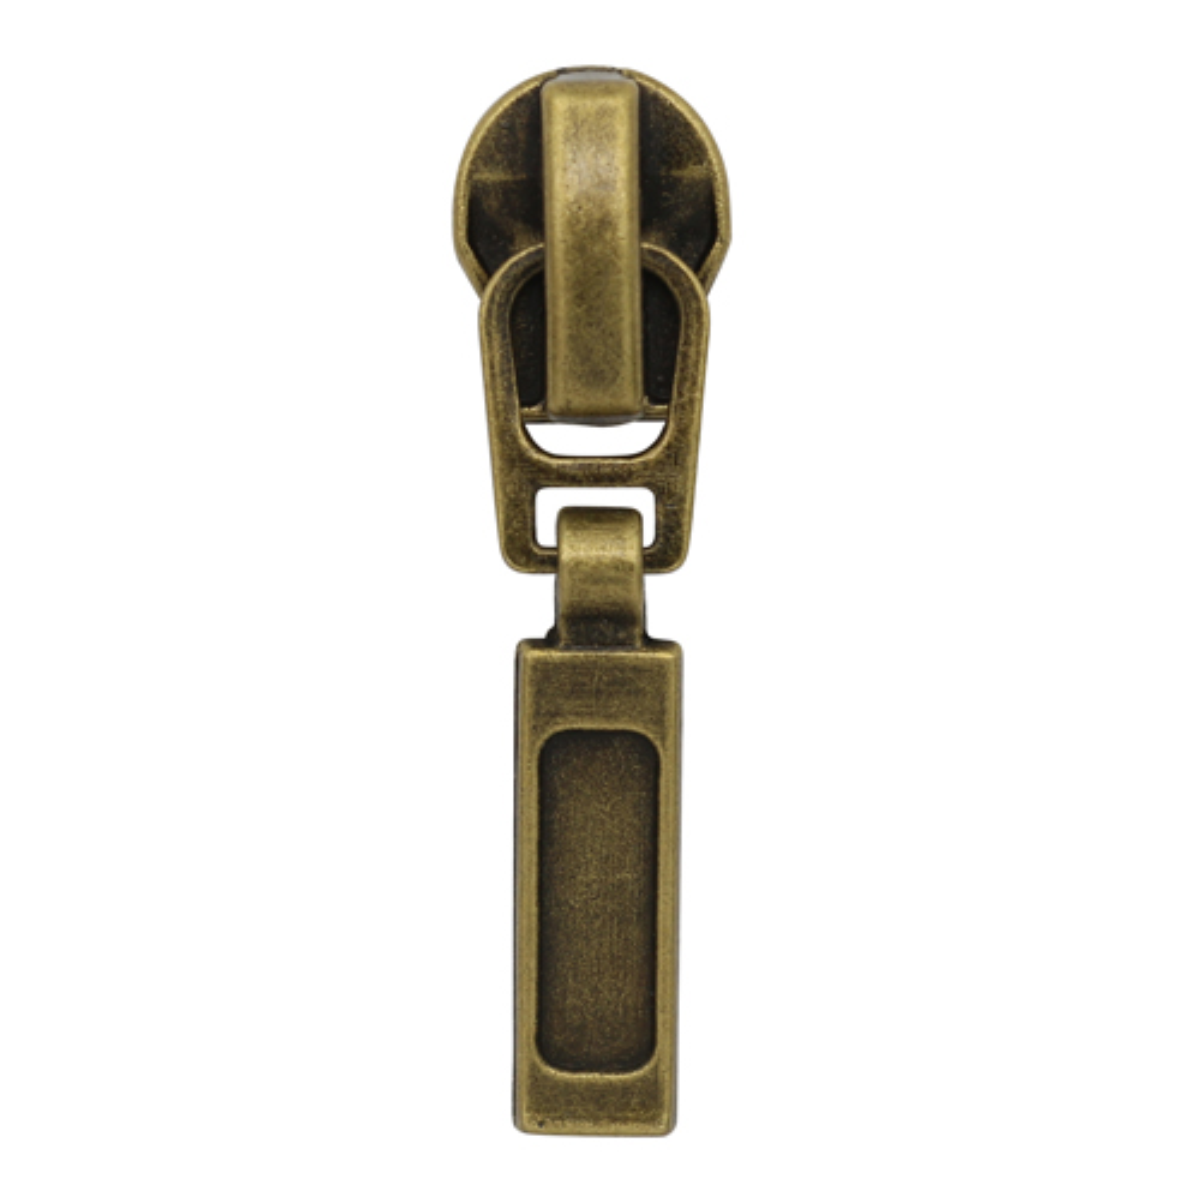 Слайдер к витой молнии Т5, N - 5414(auto lock)